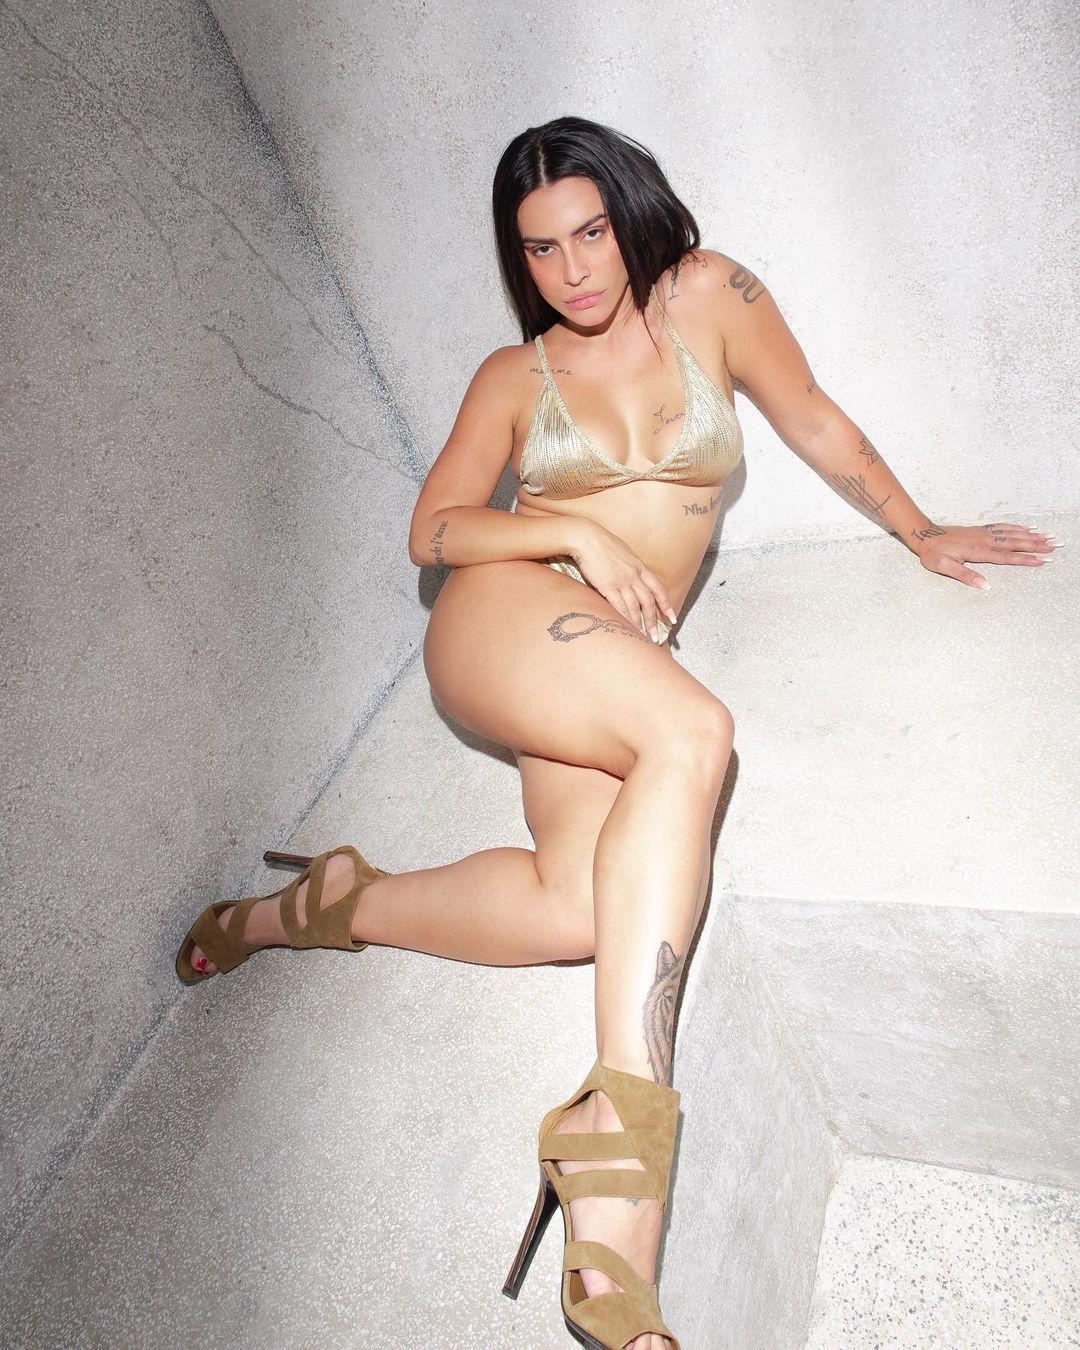 Cleo Pires usa biquíni e salto.